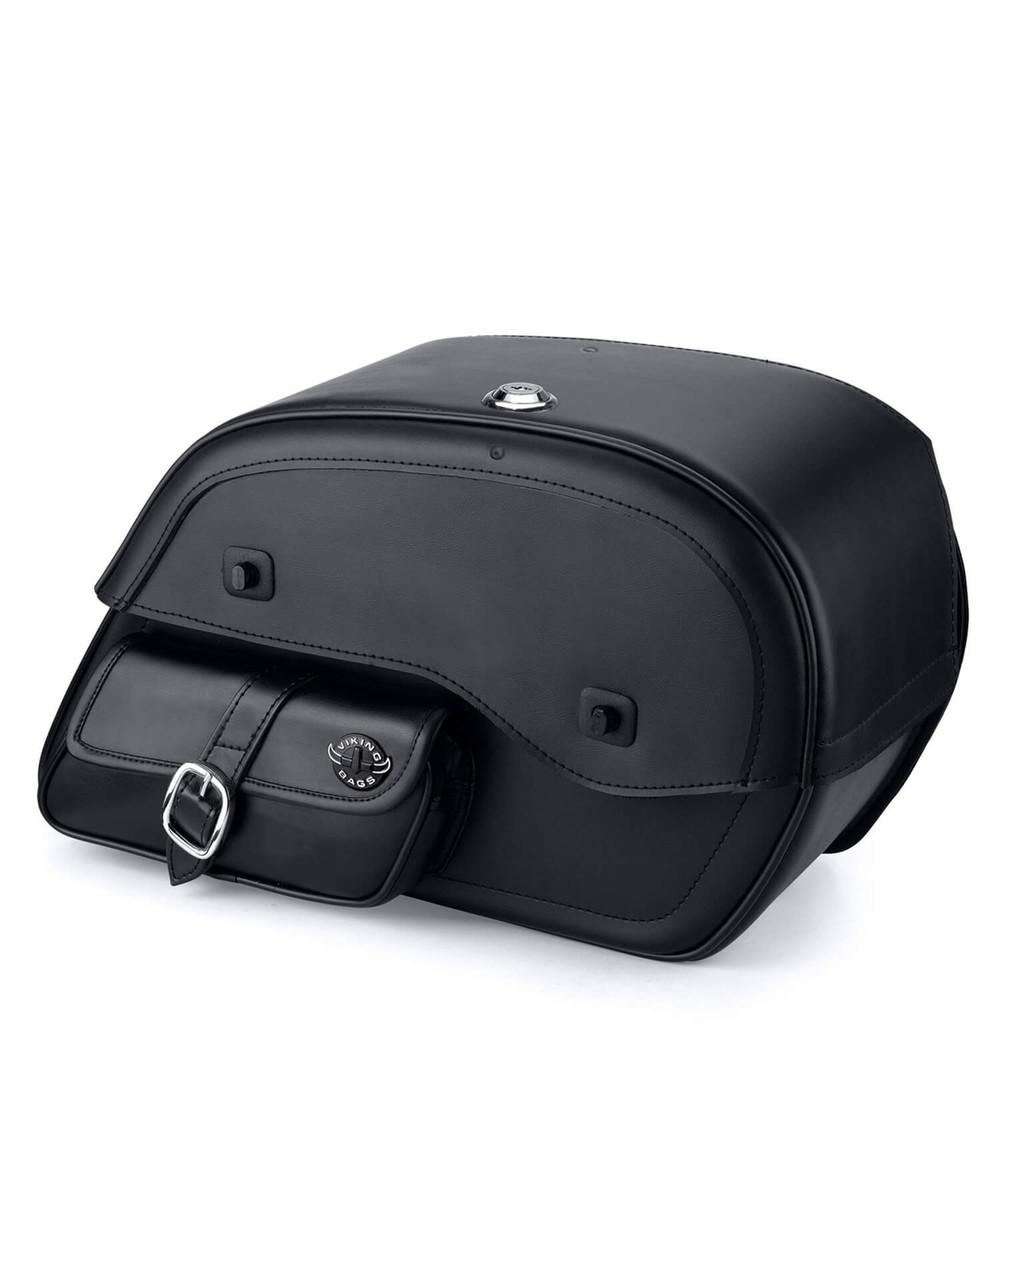 Viking Large Side Pocket Motorcycle Saddlebags For Harley Softail Custom FXSTC Main View